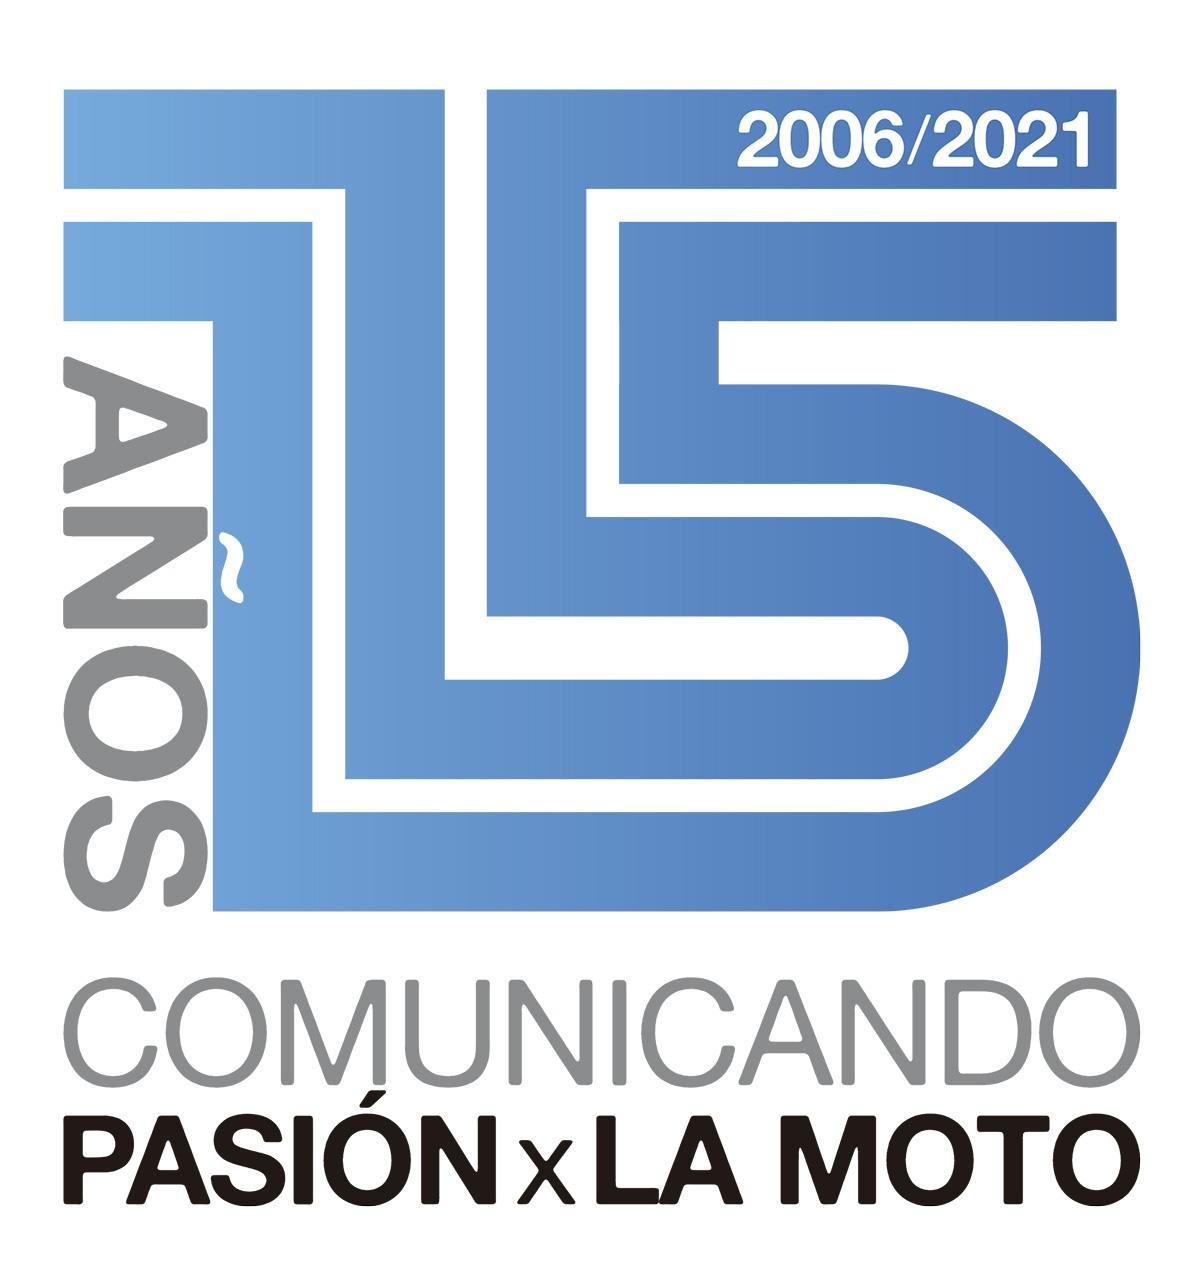 Logotipo XV aniversario Medis Grupo